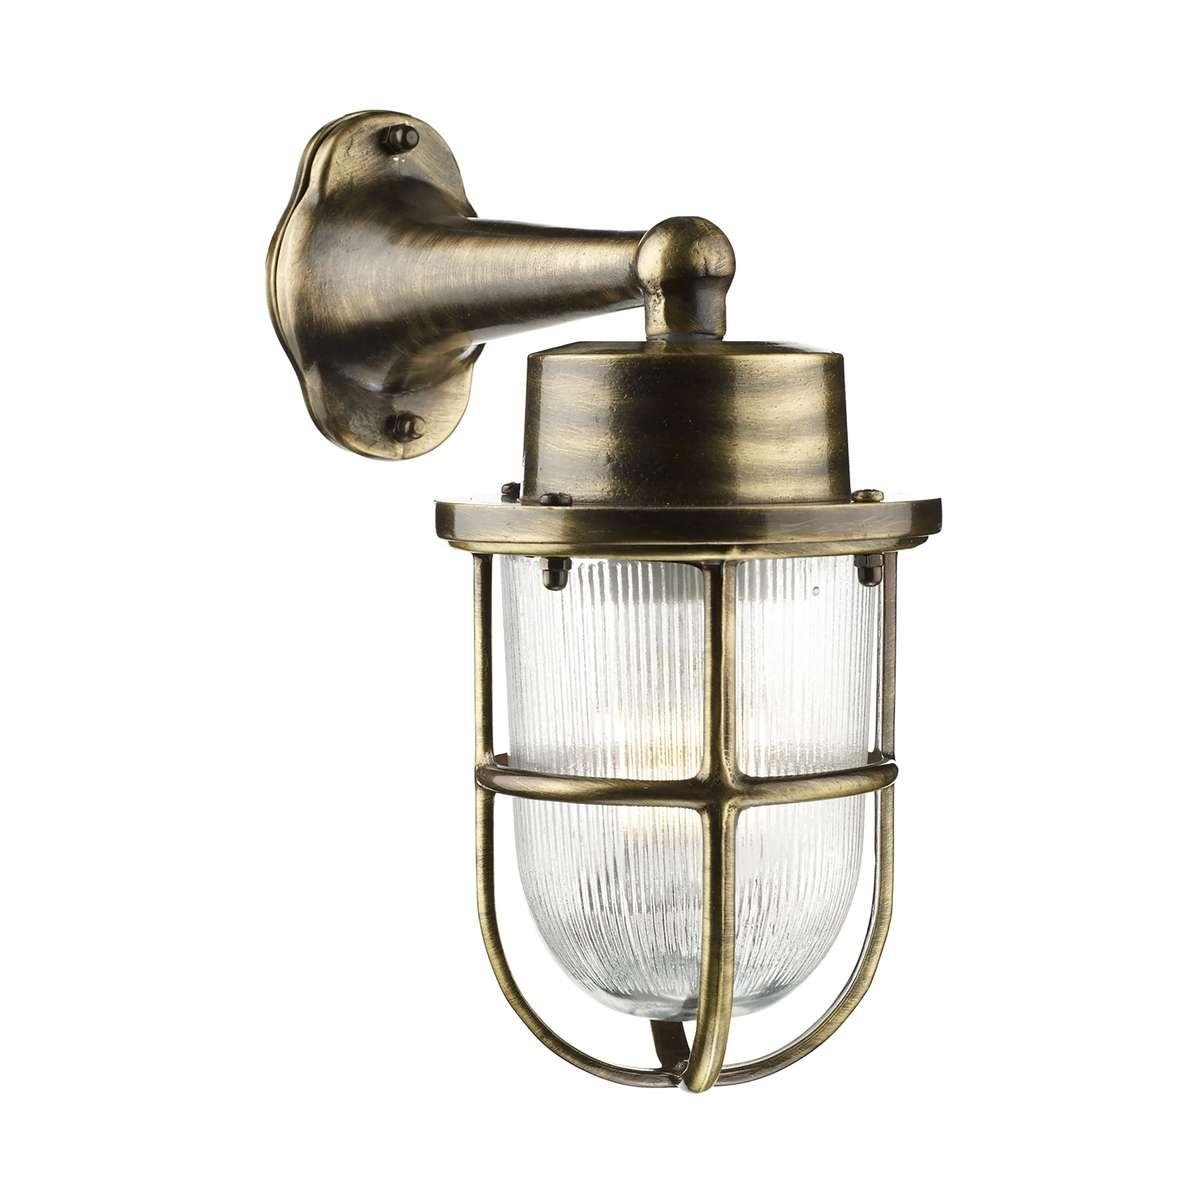 david hunt lighting har1575 harbour outdoor wall light antique brass